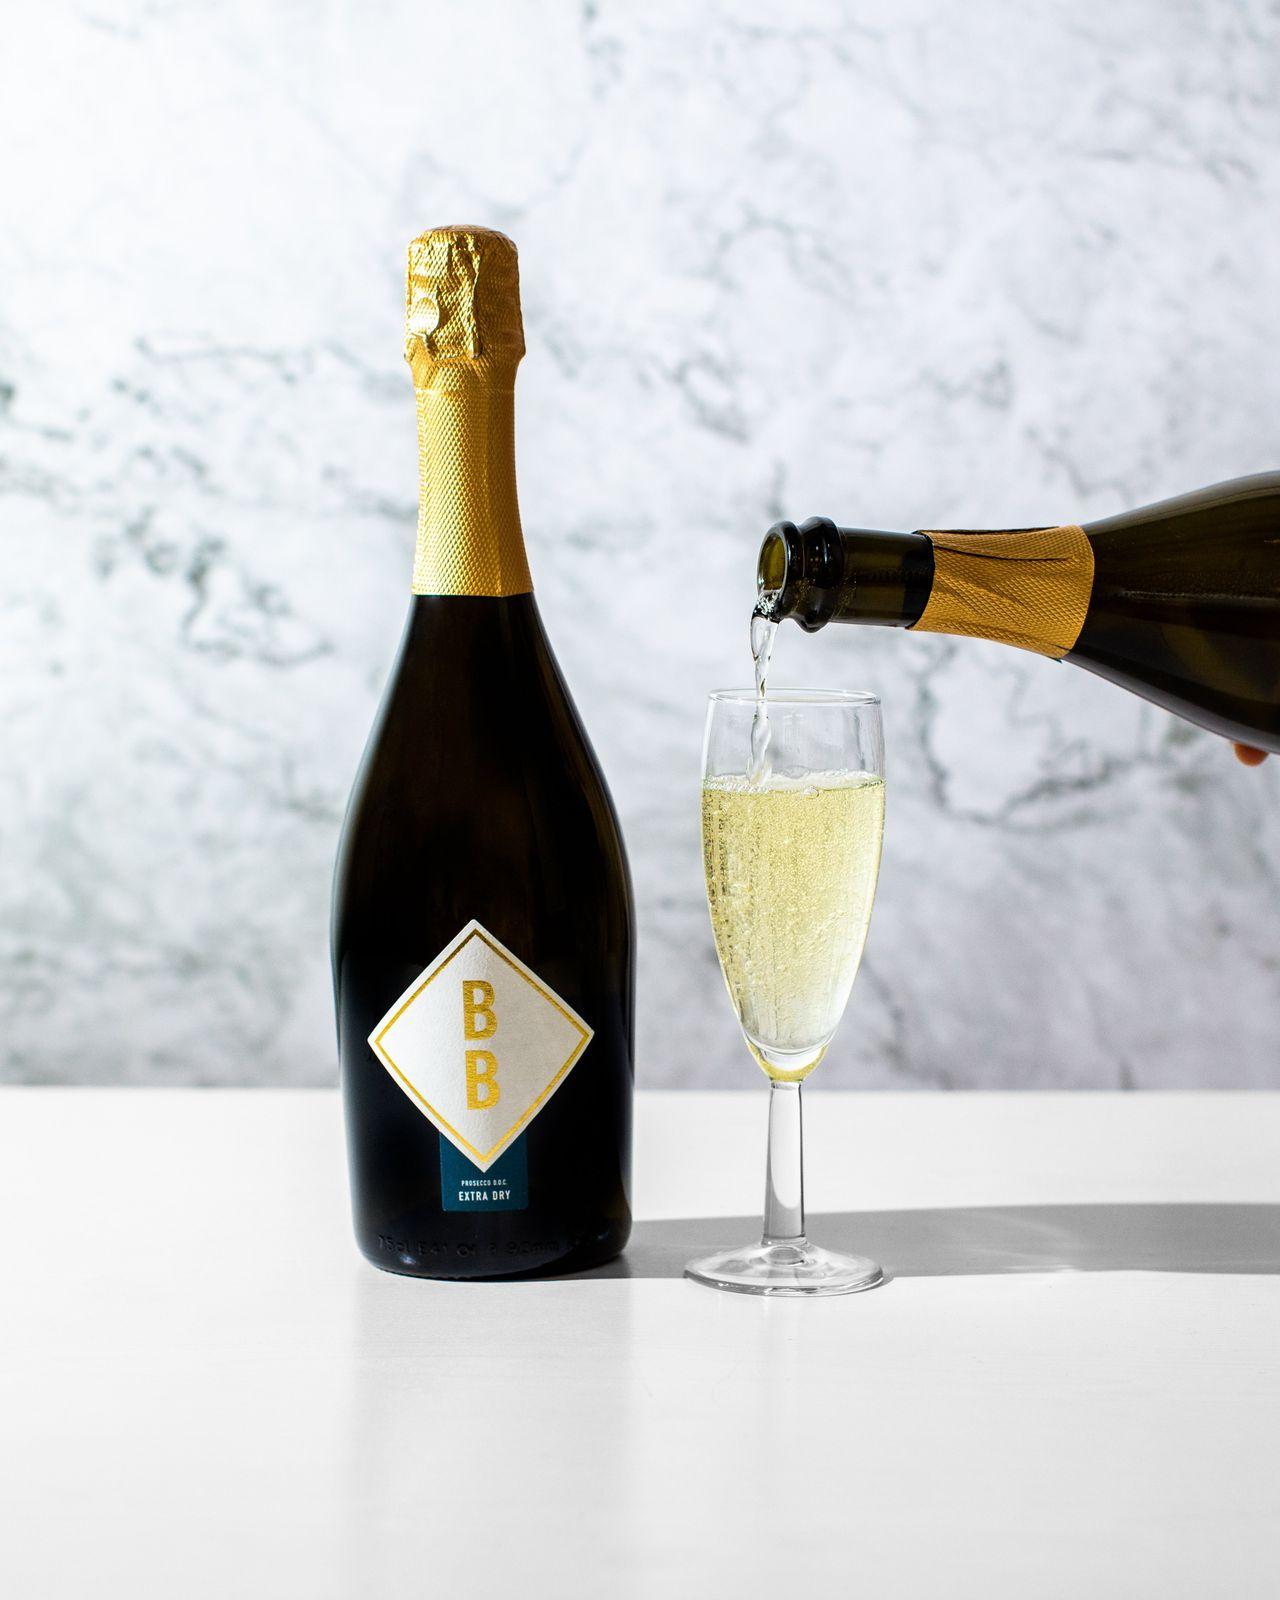 Bottle - BB Extra Dry Prosecco, Bubble Bros Ltd